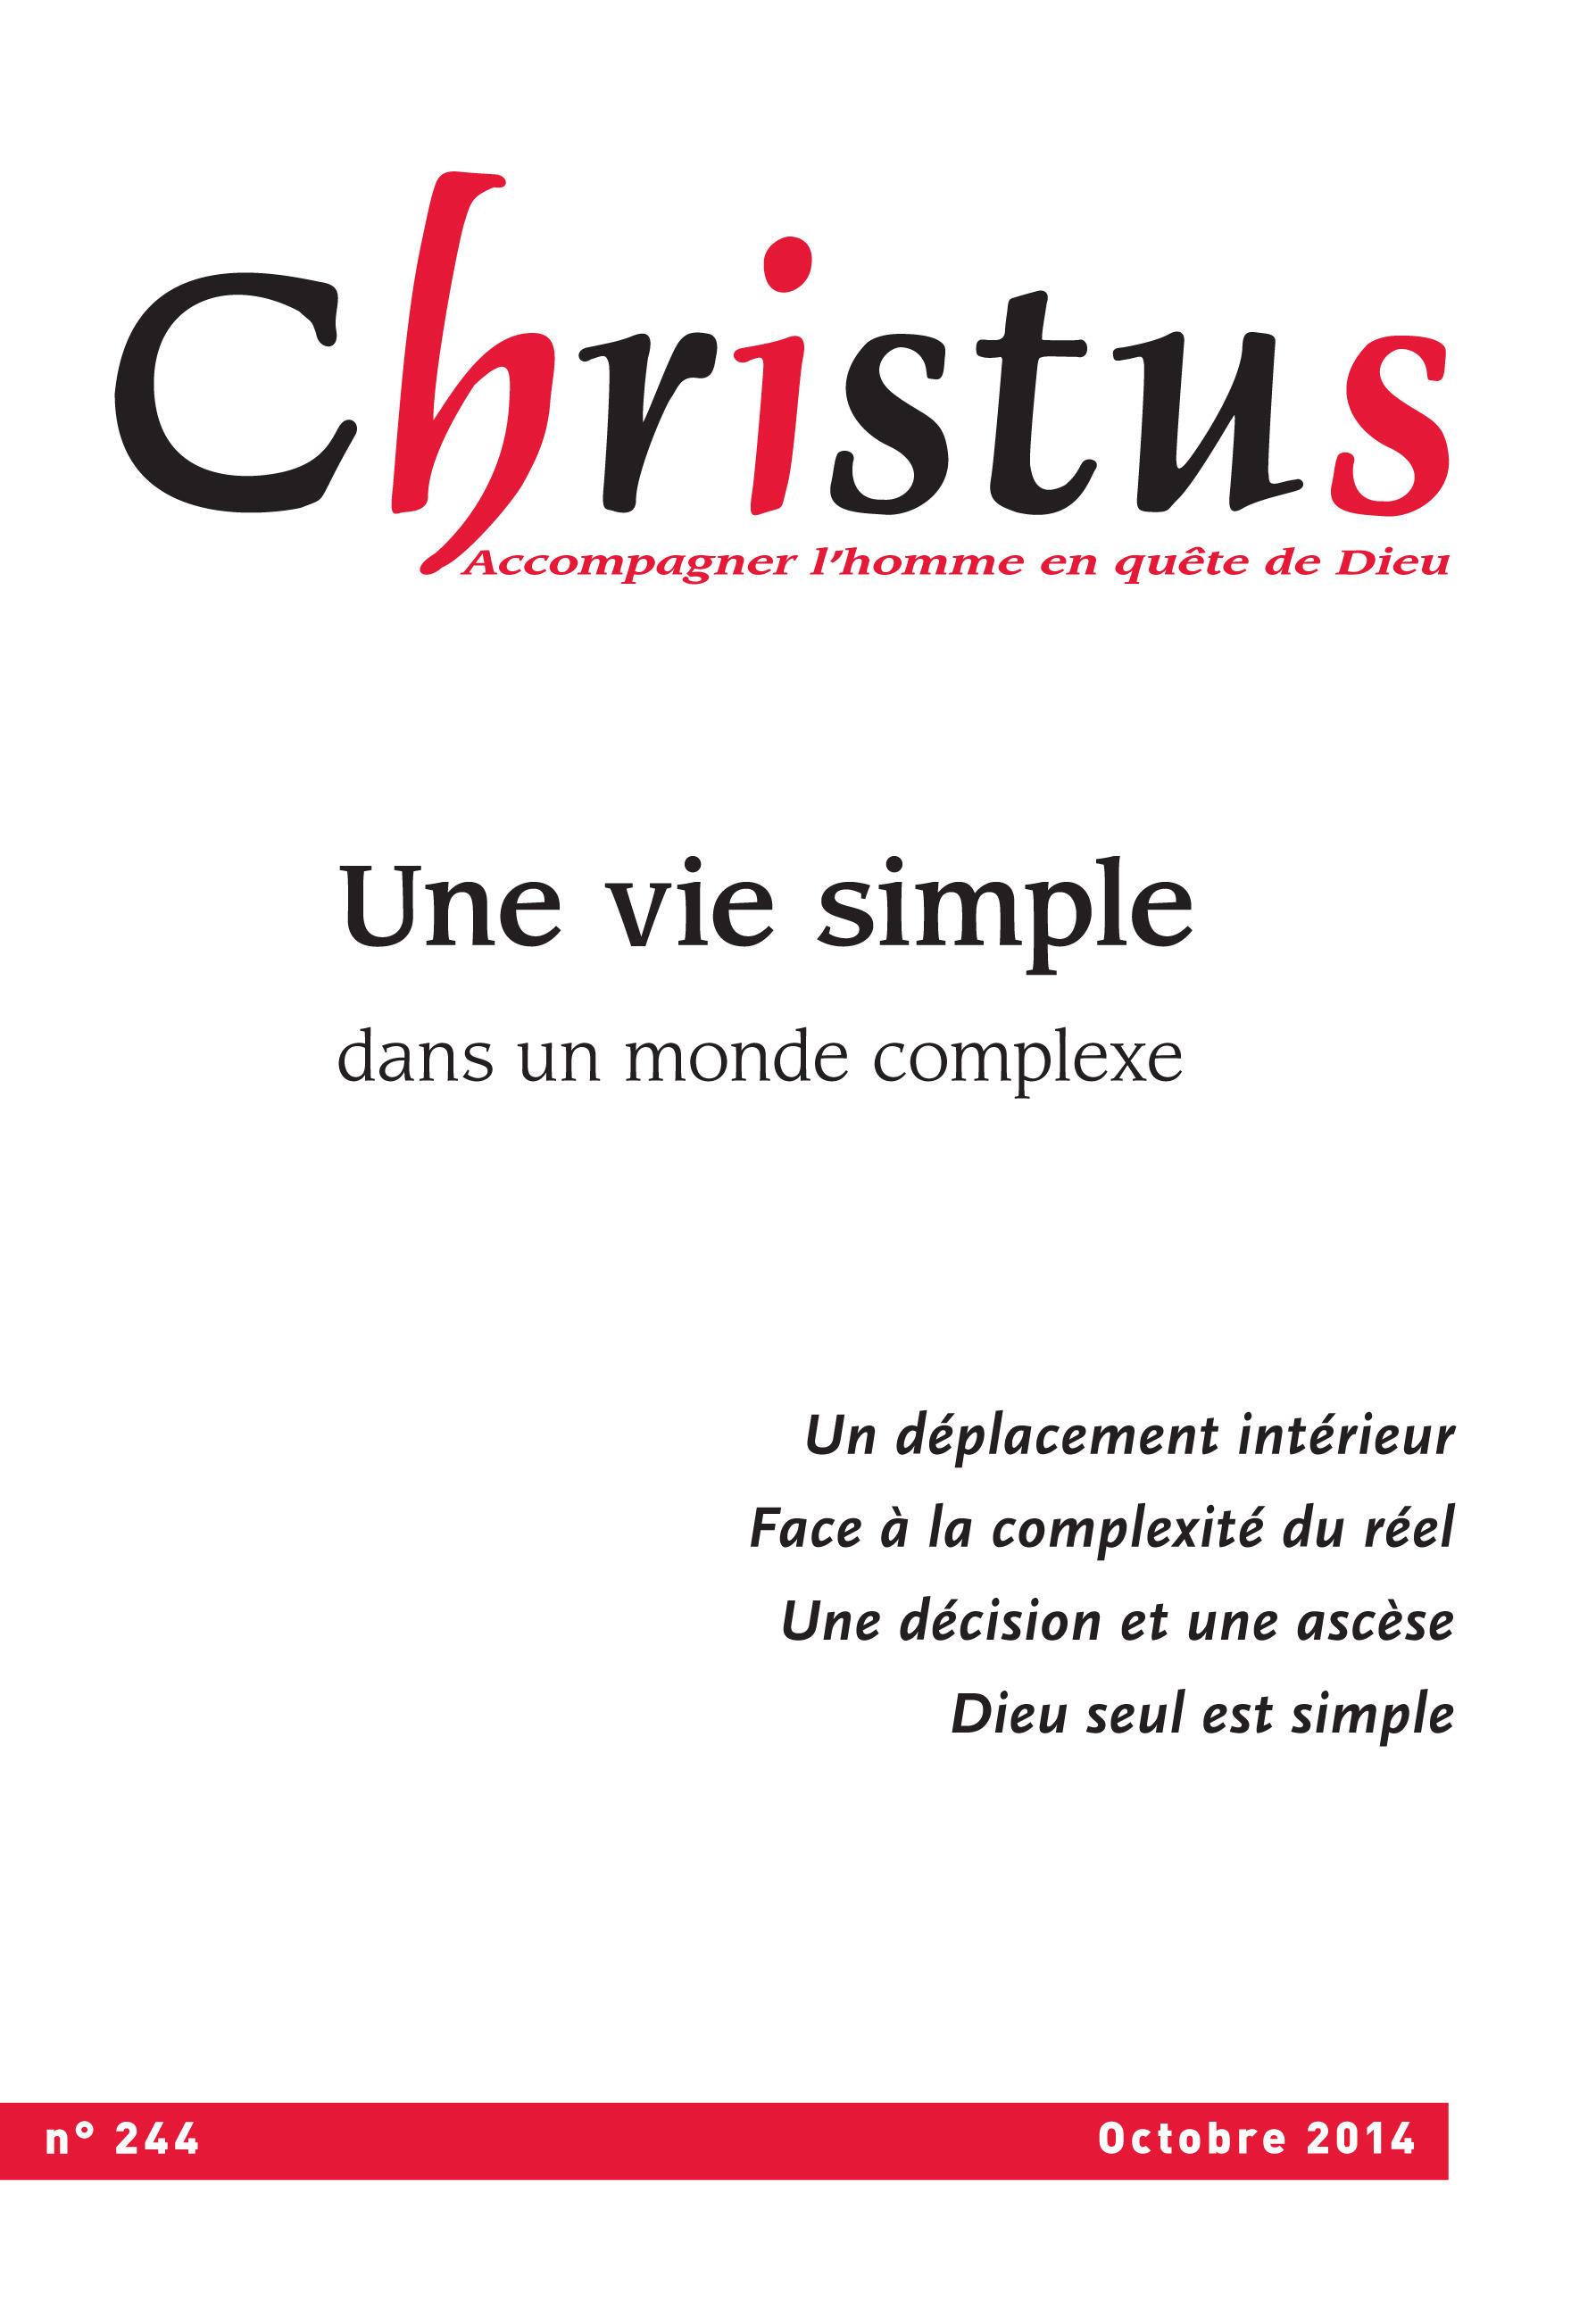 Christus Octobre 2014 - N°244